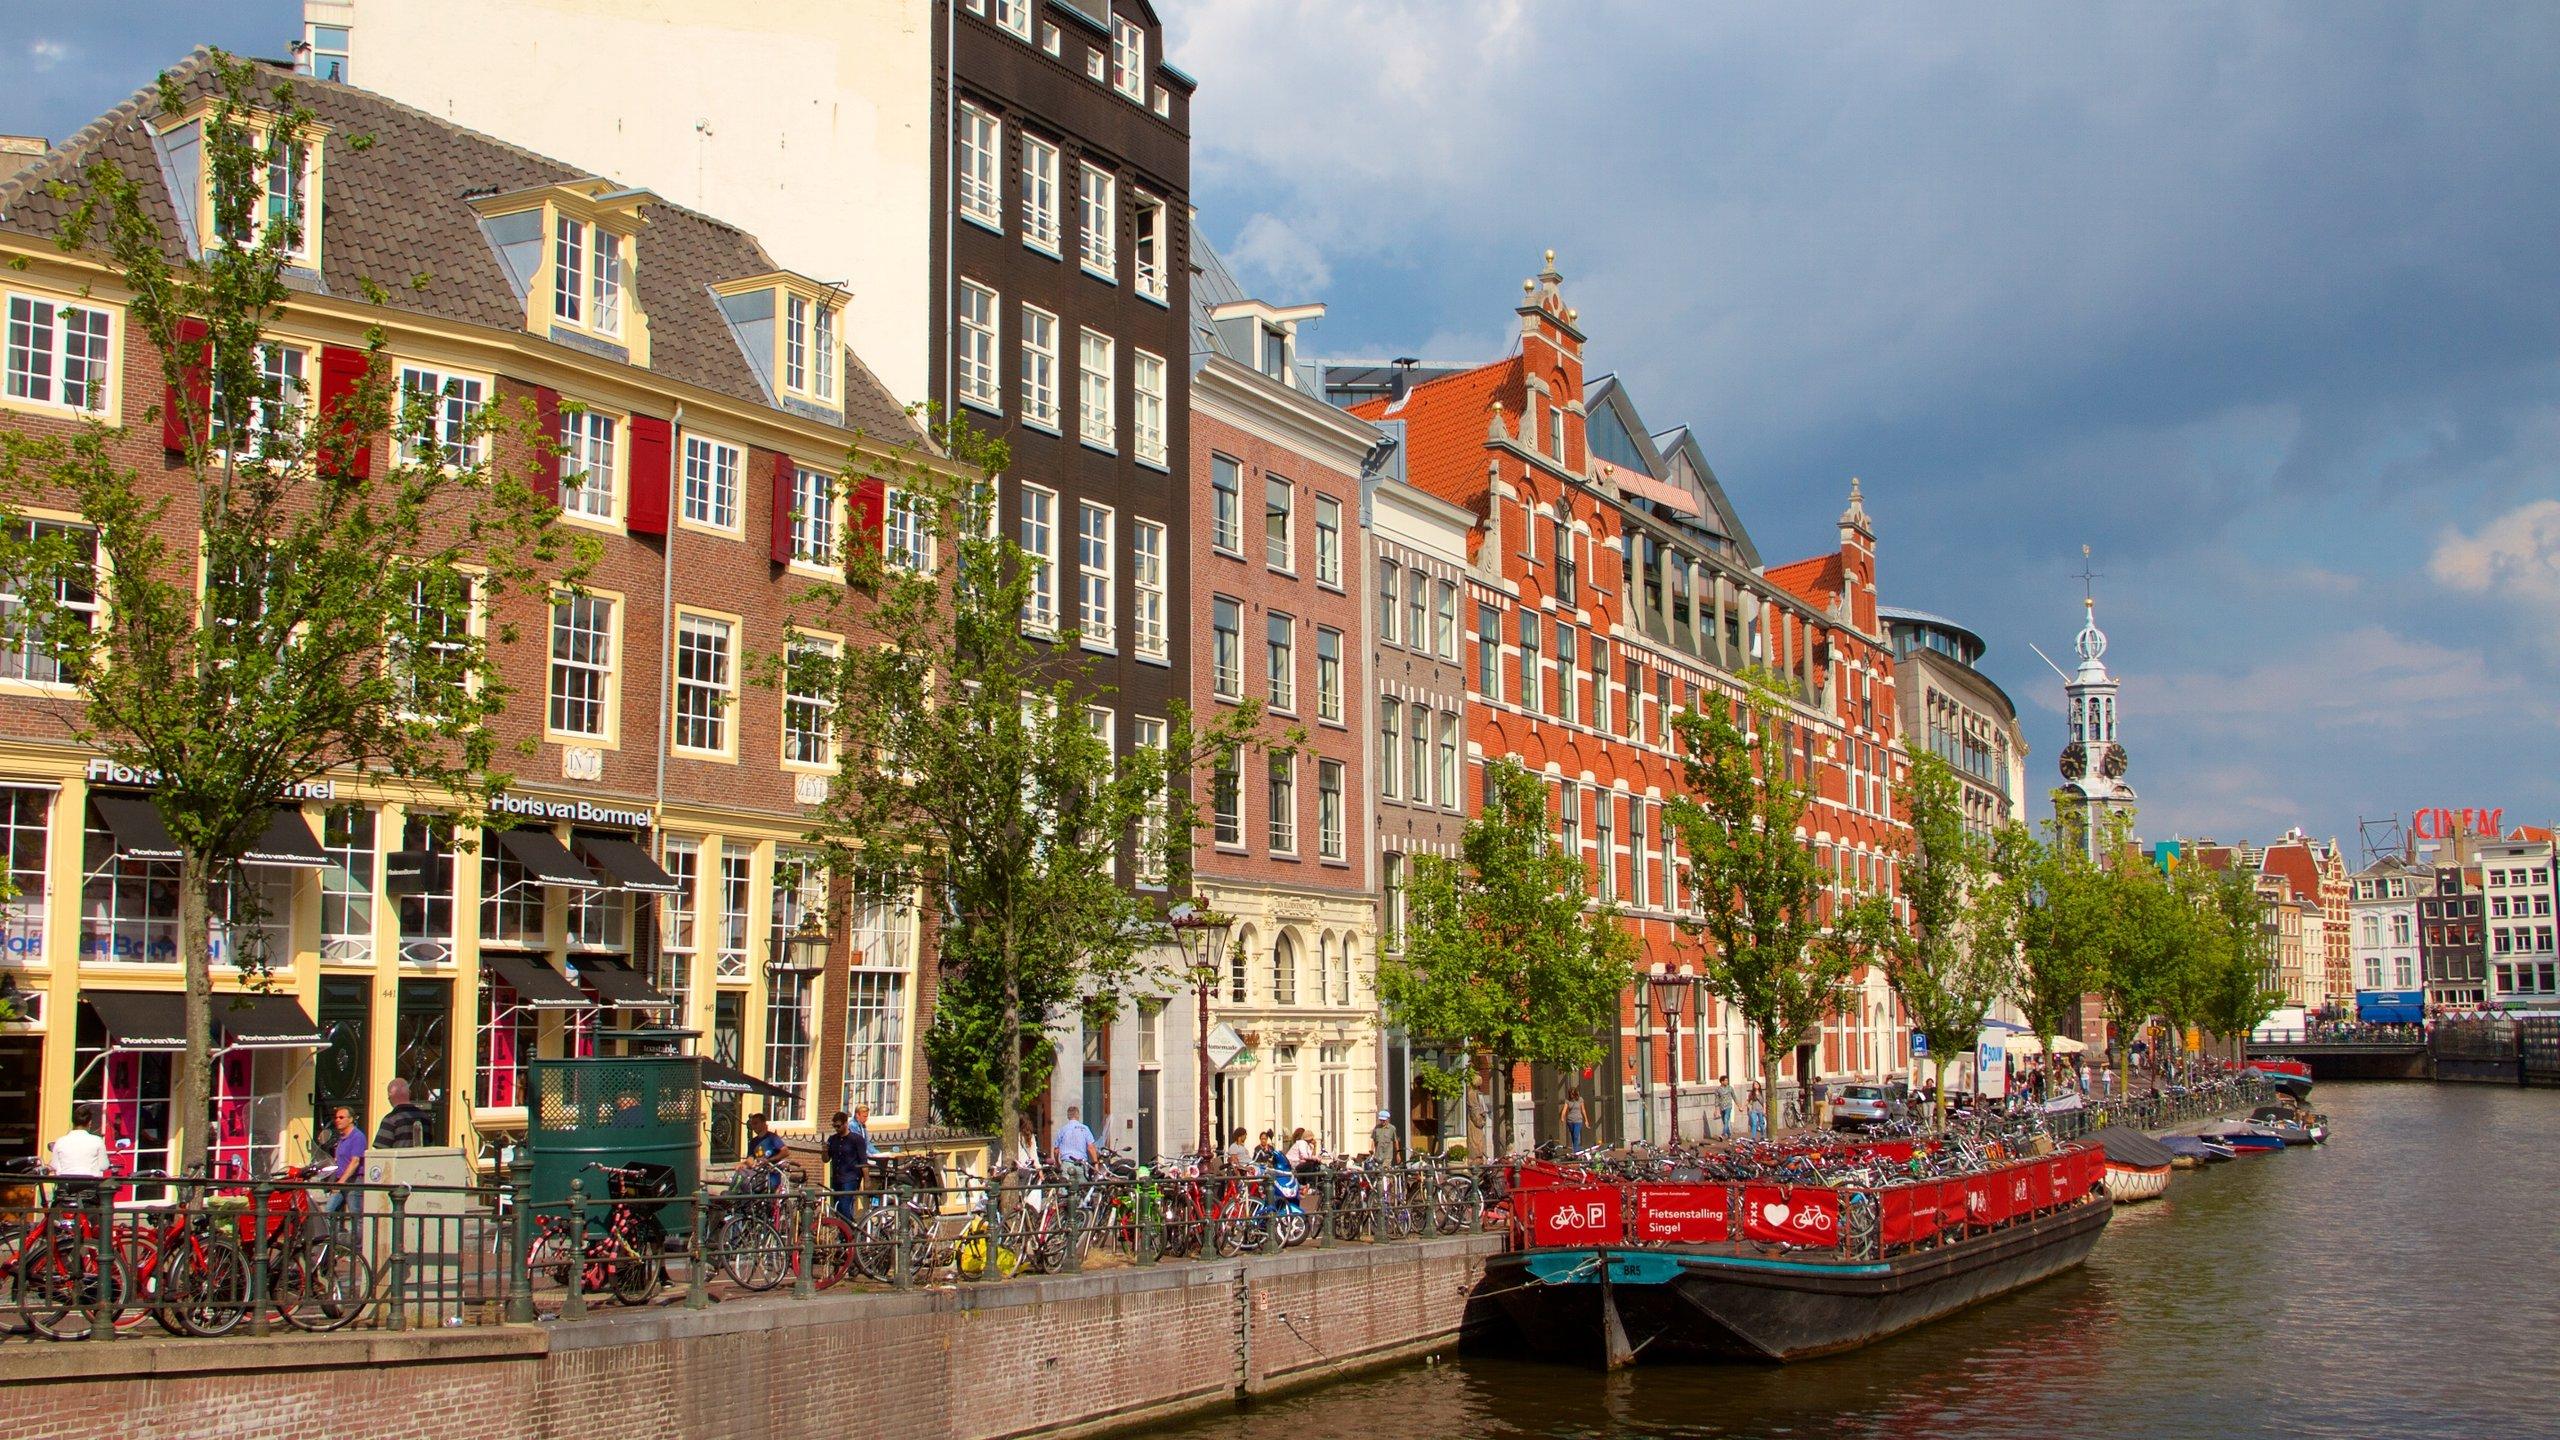 Singel, Amsterdam, North Holland, Netherlands